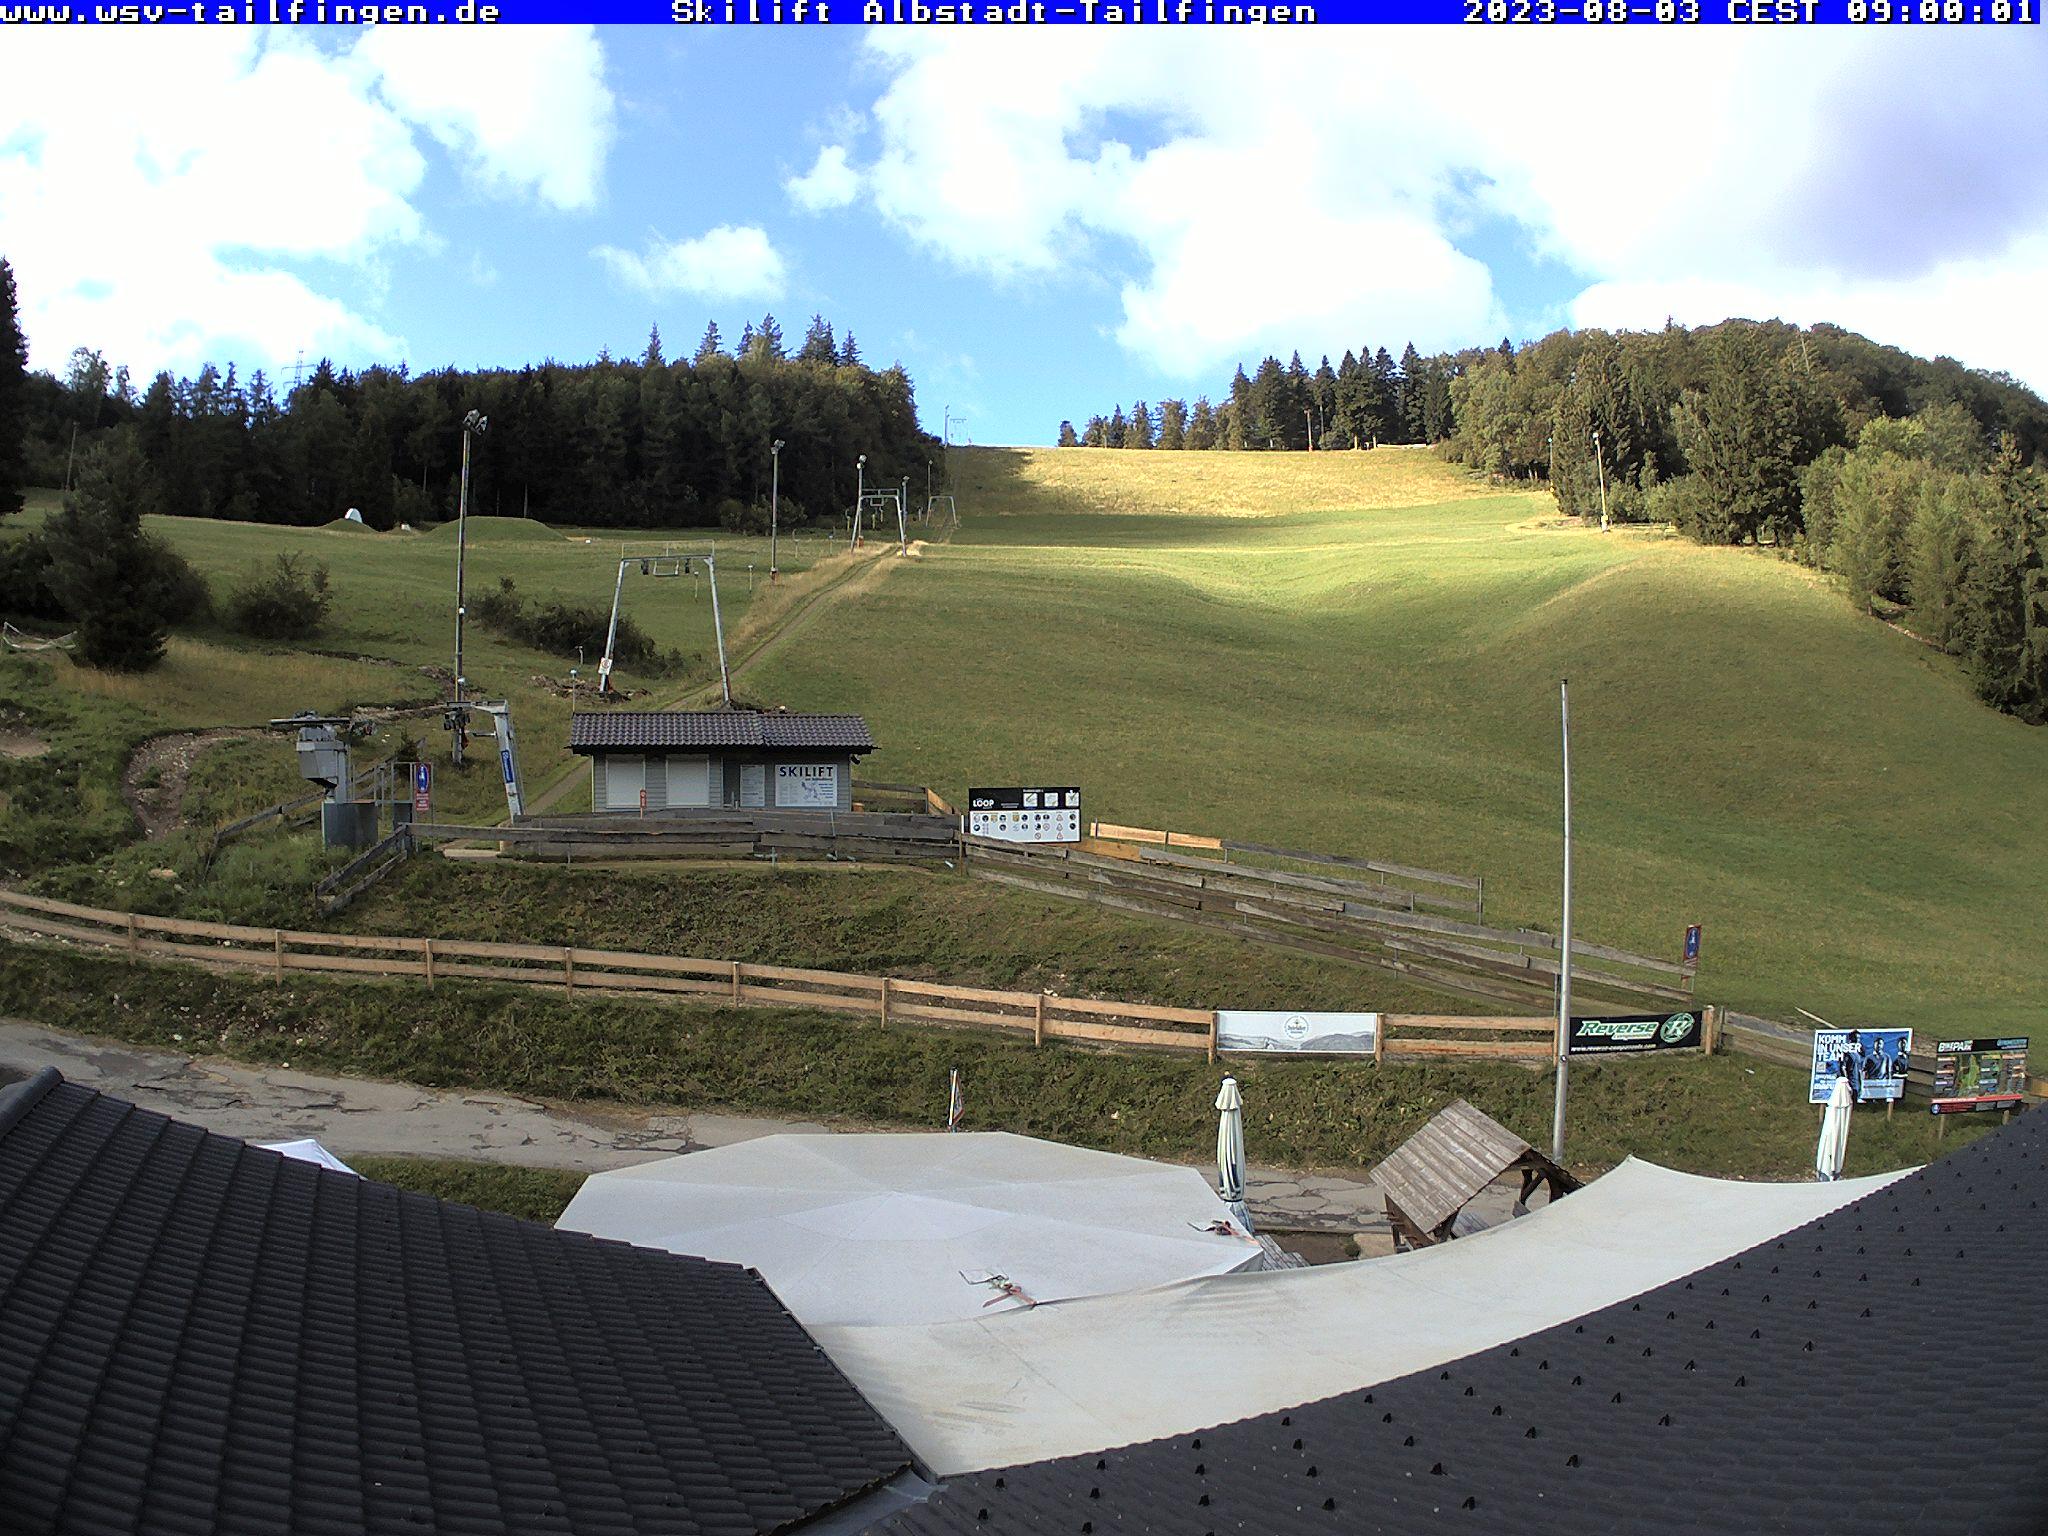 Webcam-Foto 09:00 Uhr / Skilift Albstadt-Tailfingen